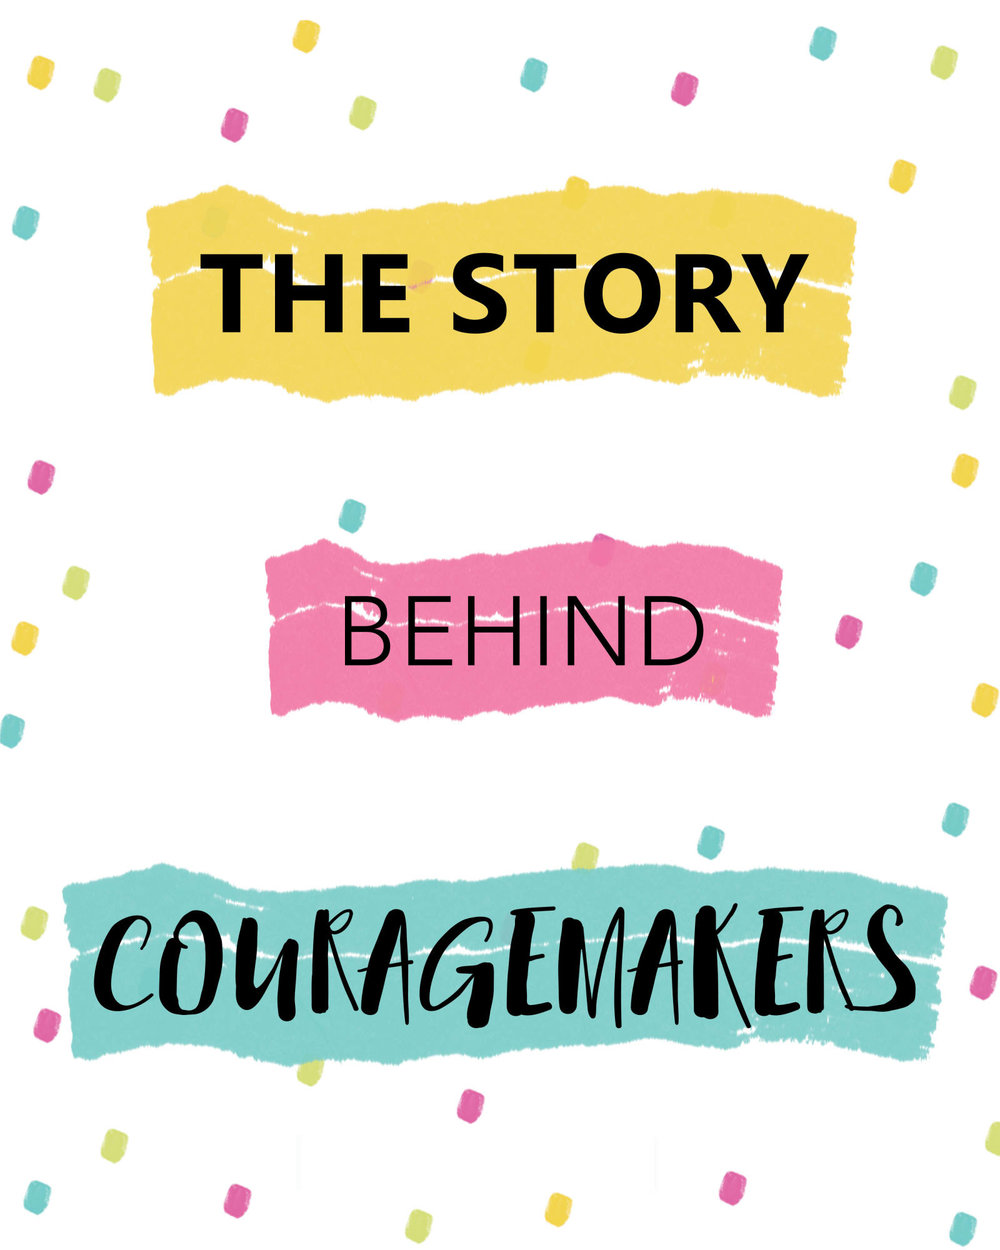 couragemakers-story.jpg